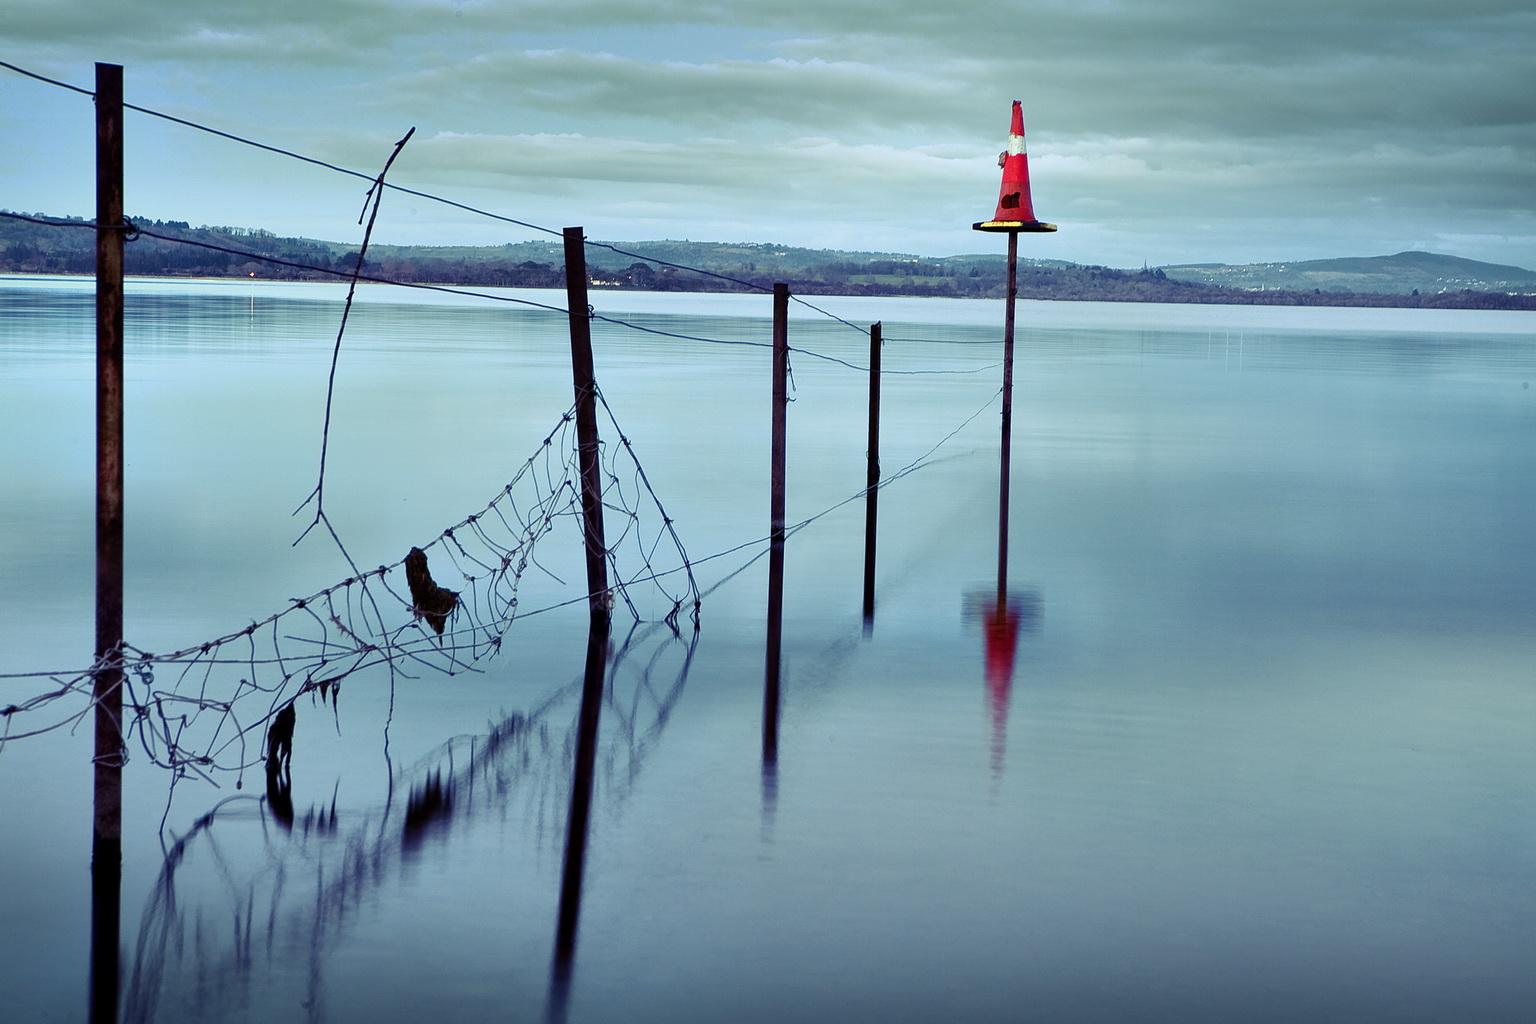 Lough Leane, Killarney, Co. Kerry